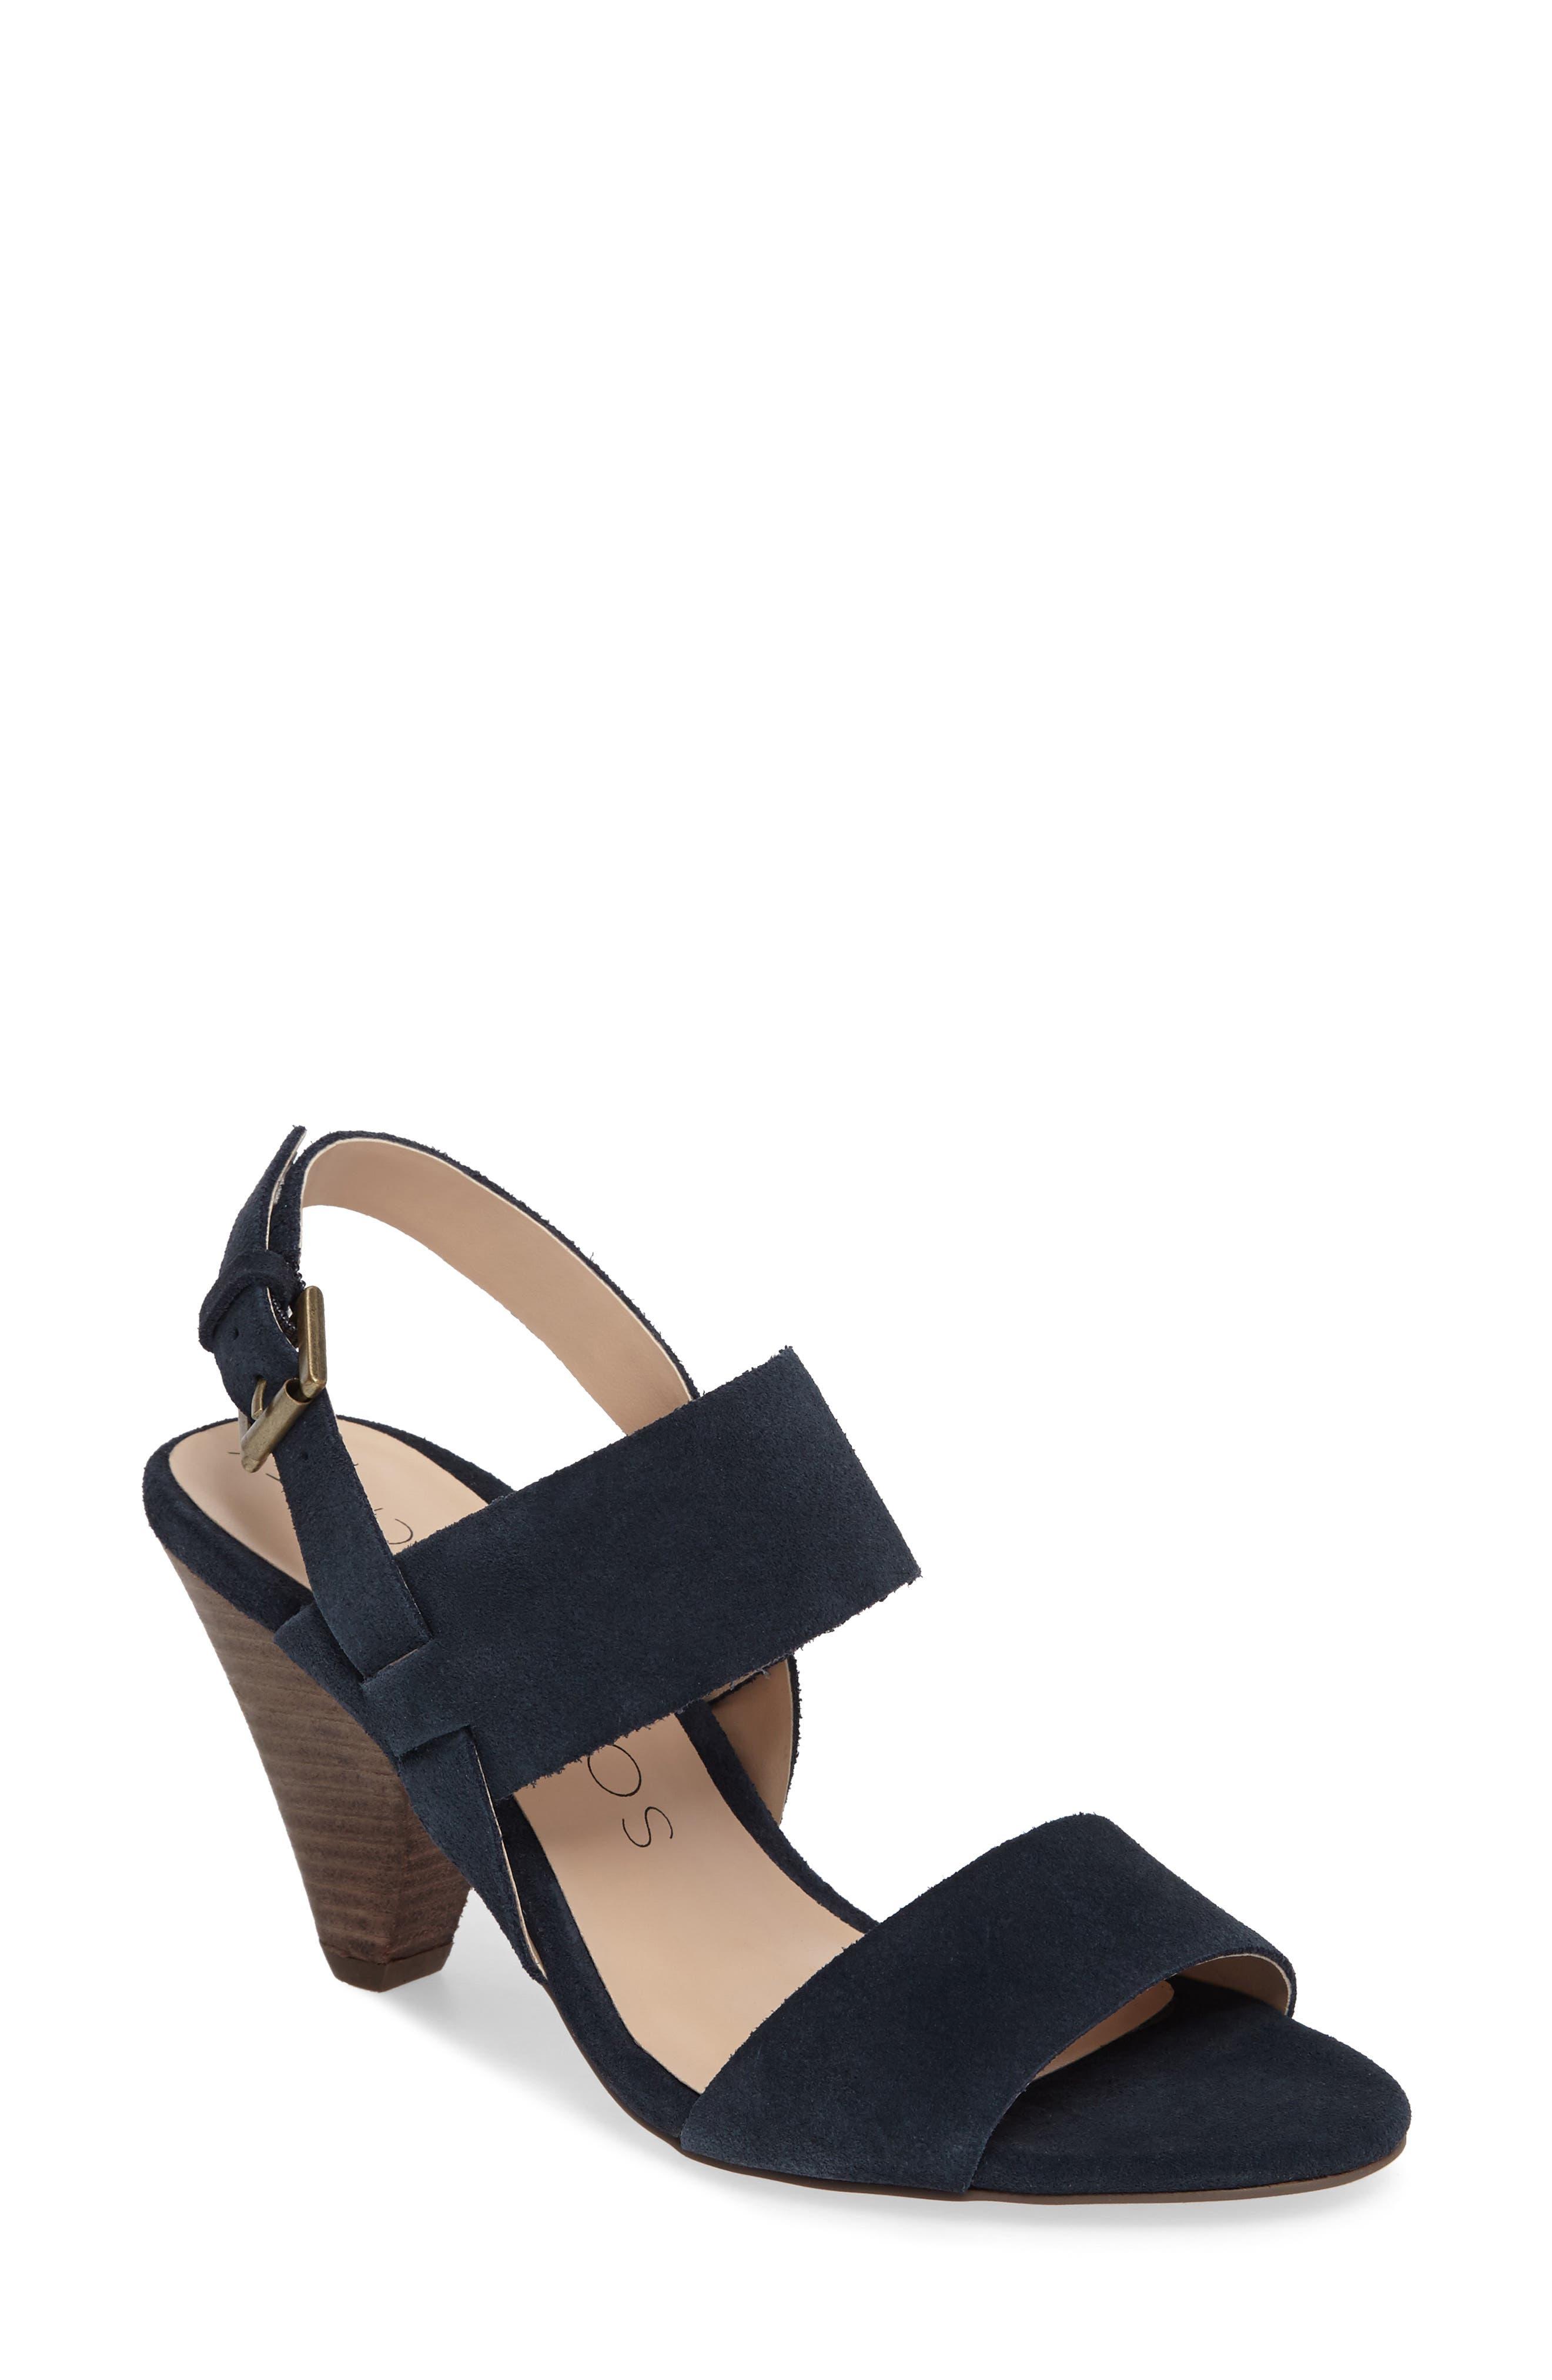 Main Image - Sole Society Valor Cone Heel Sandal (Women)